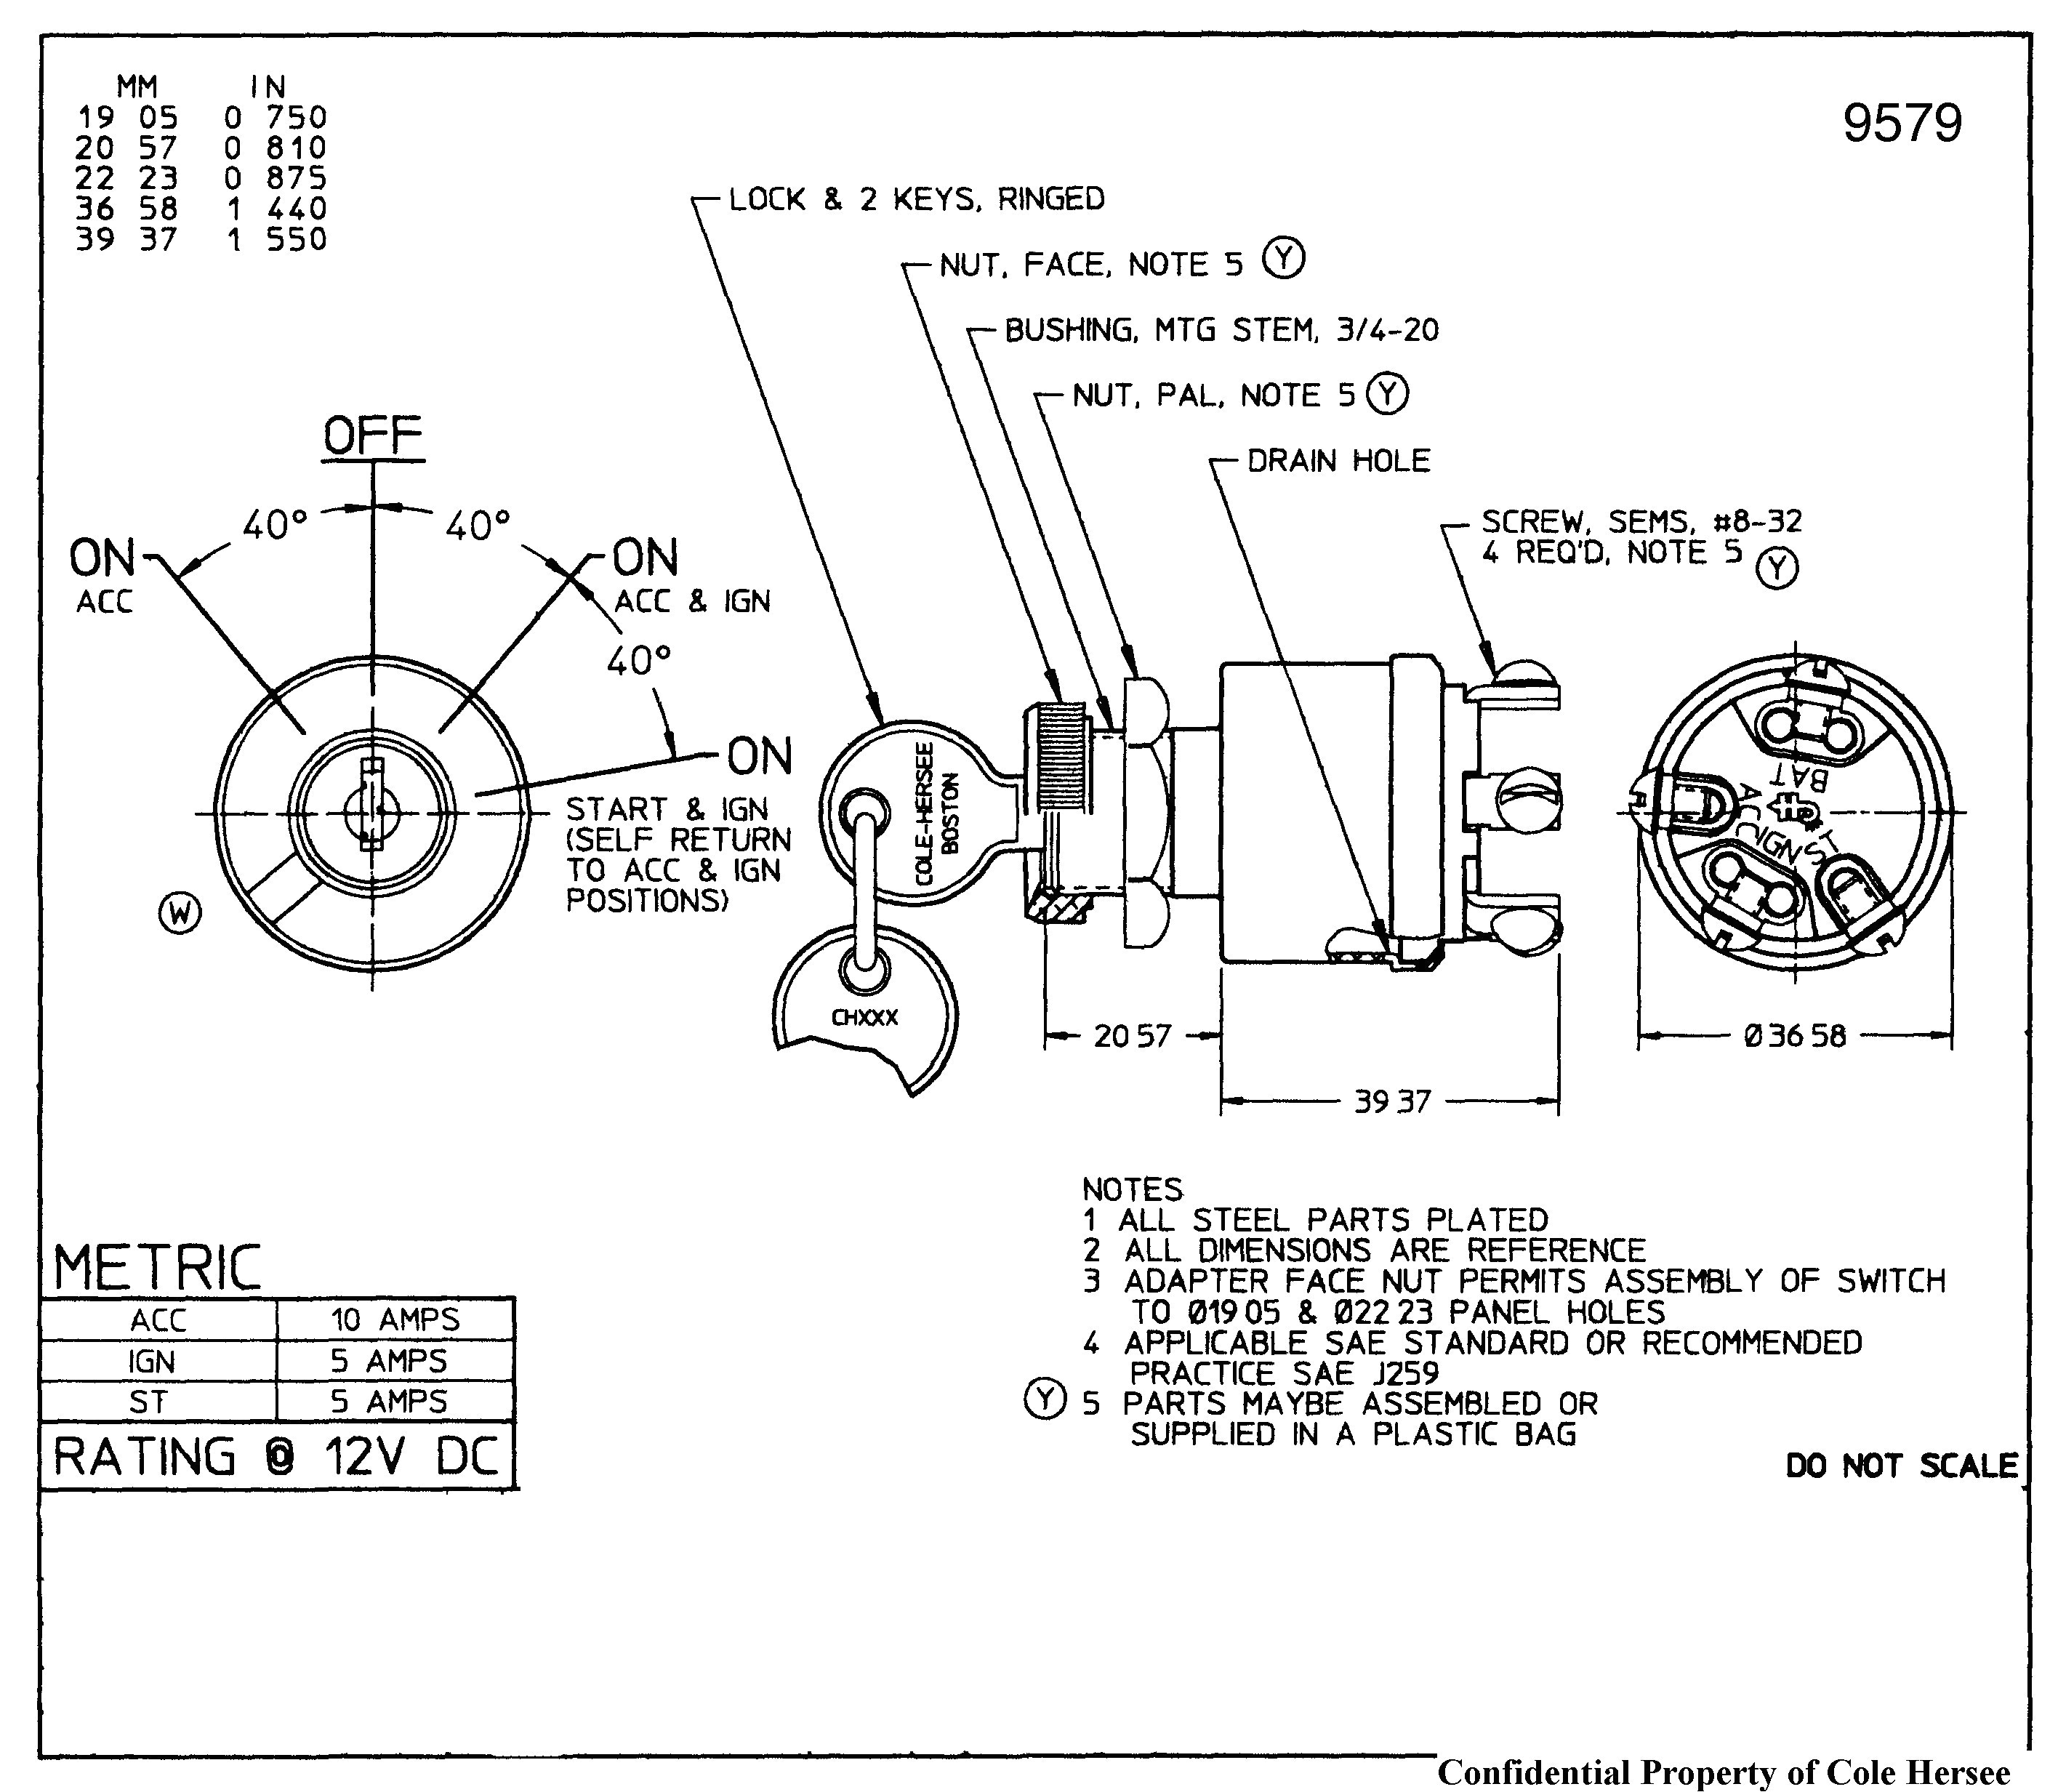 4 wire universal ignition switch diagram wiring diagram expert universal tractor ignition switch wiring wiring diagram